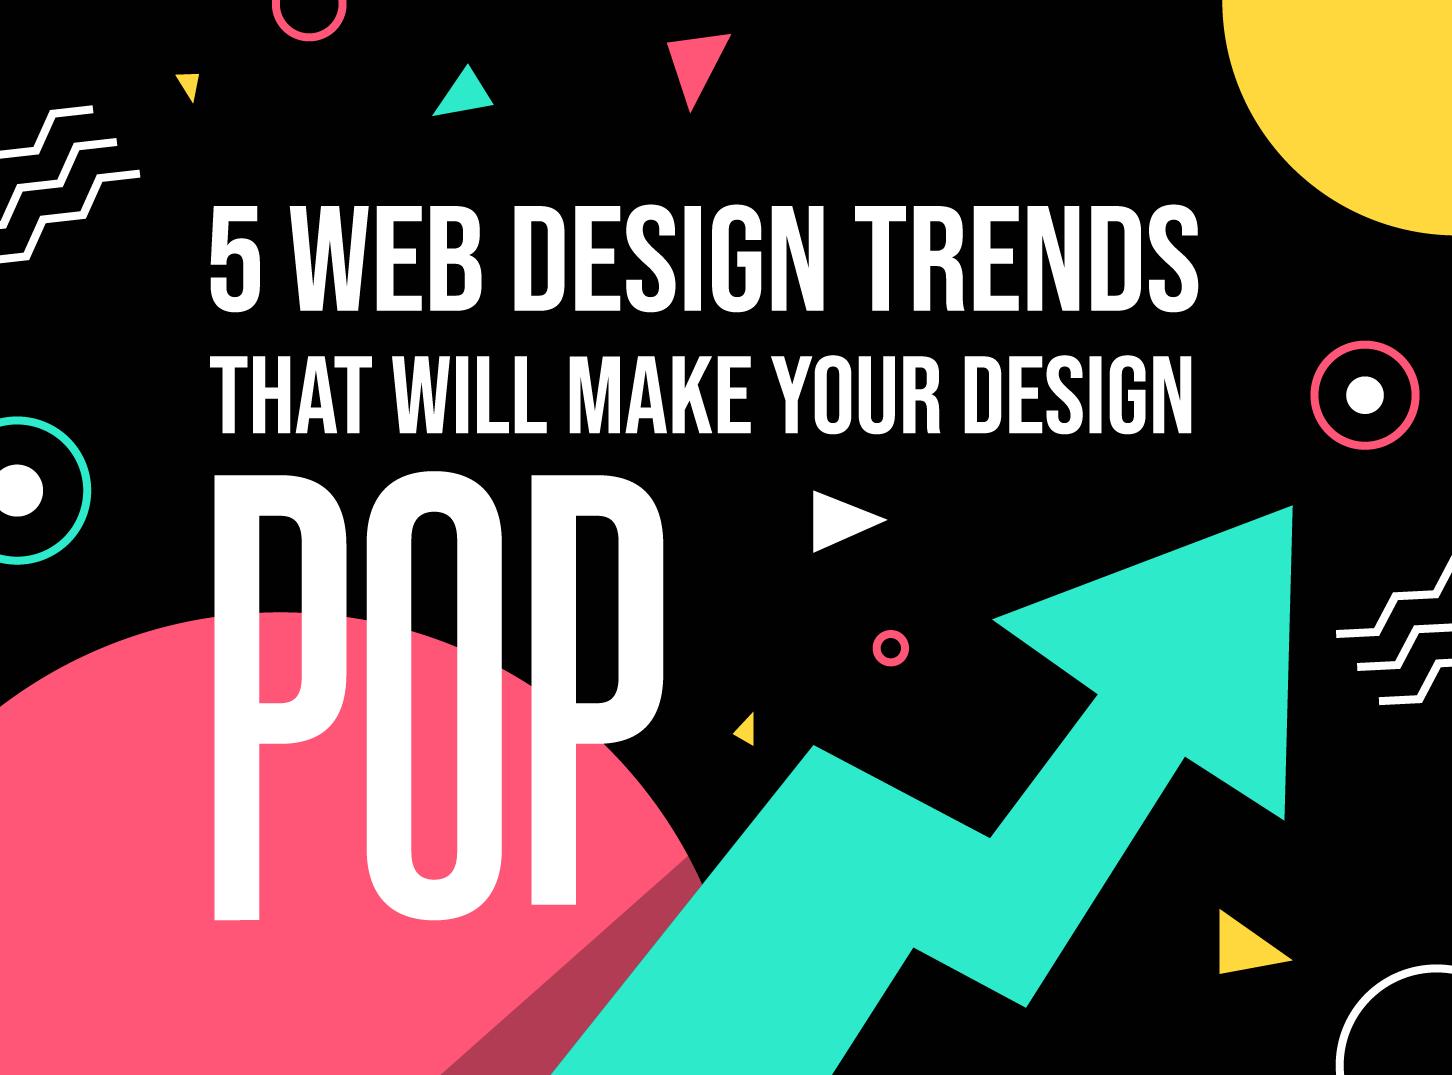 5 Web Design Trends That Will Make Your Design Pop - Inkyy web design studio